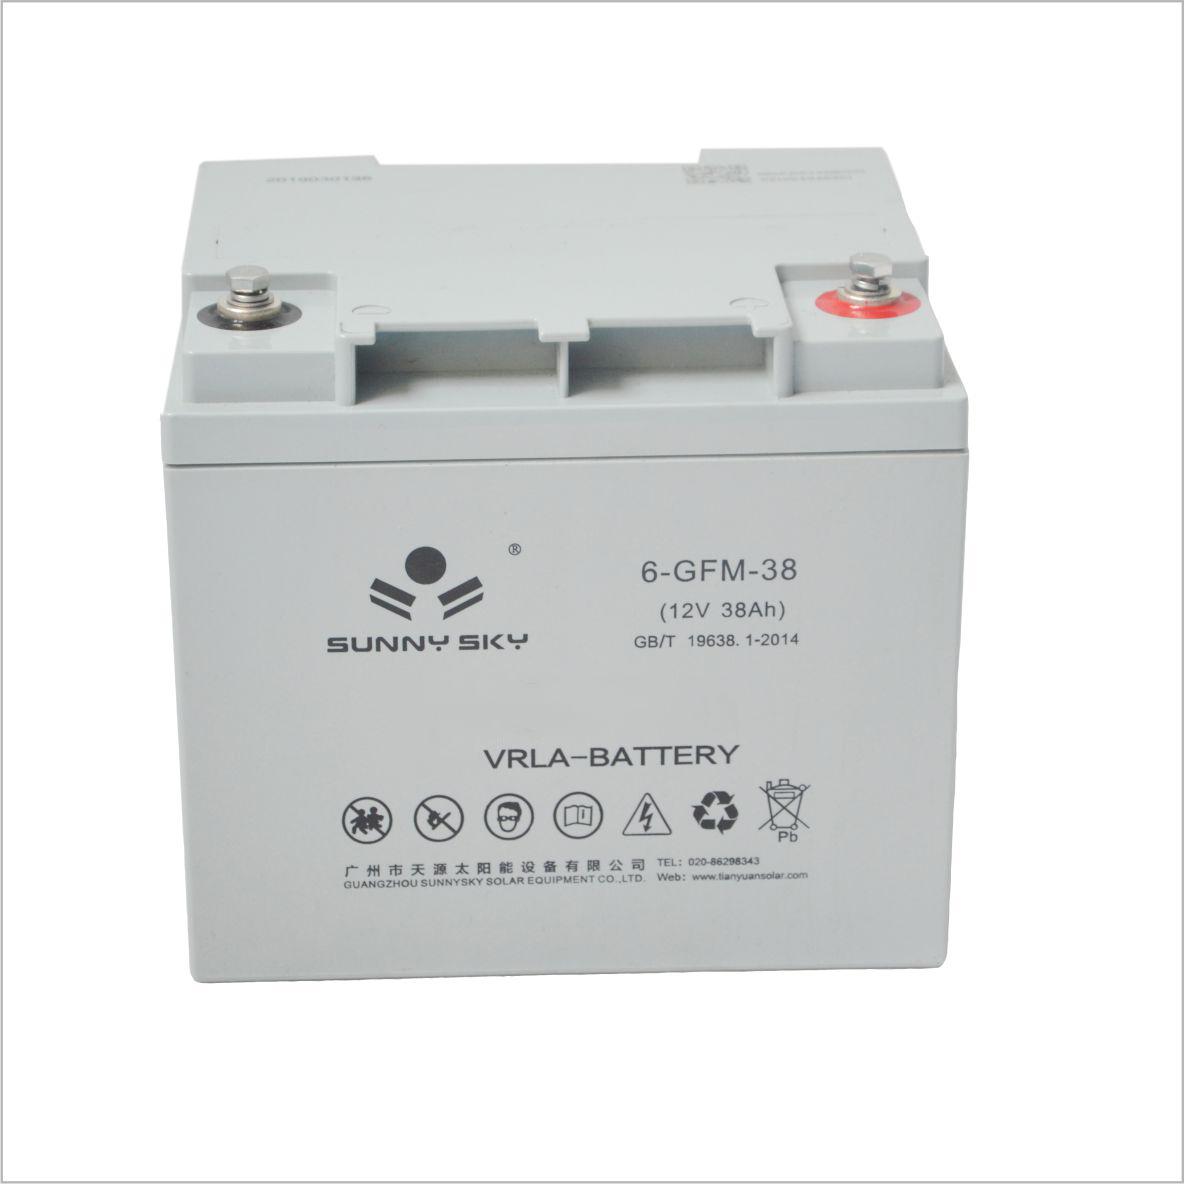 12 volt storage battery for solar panel